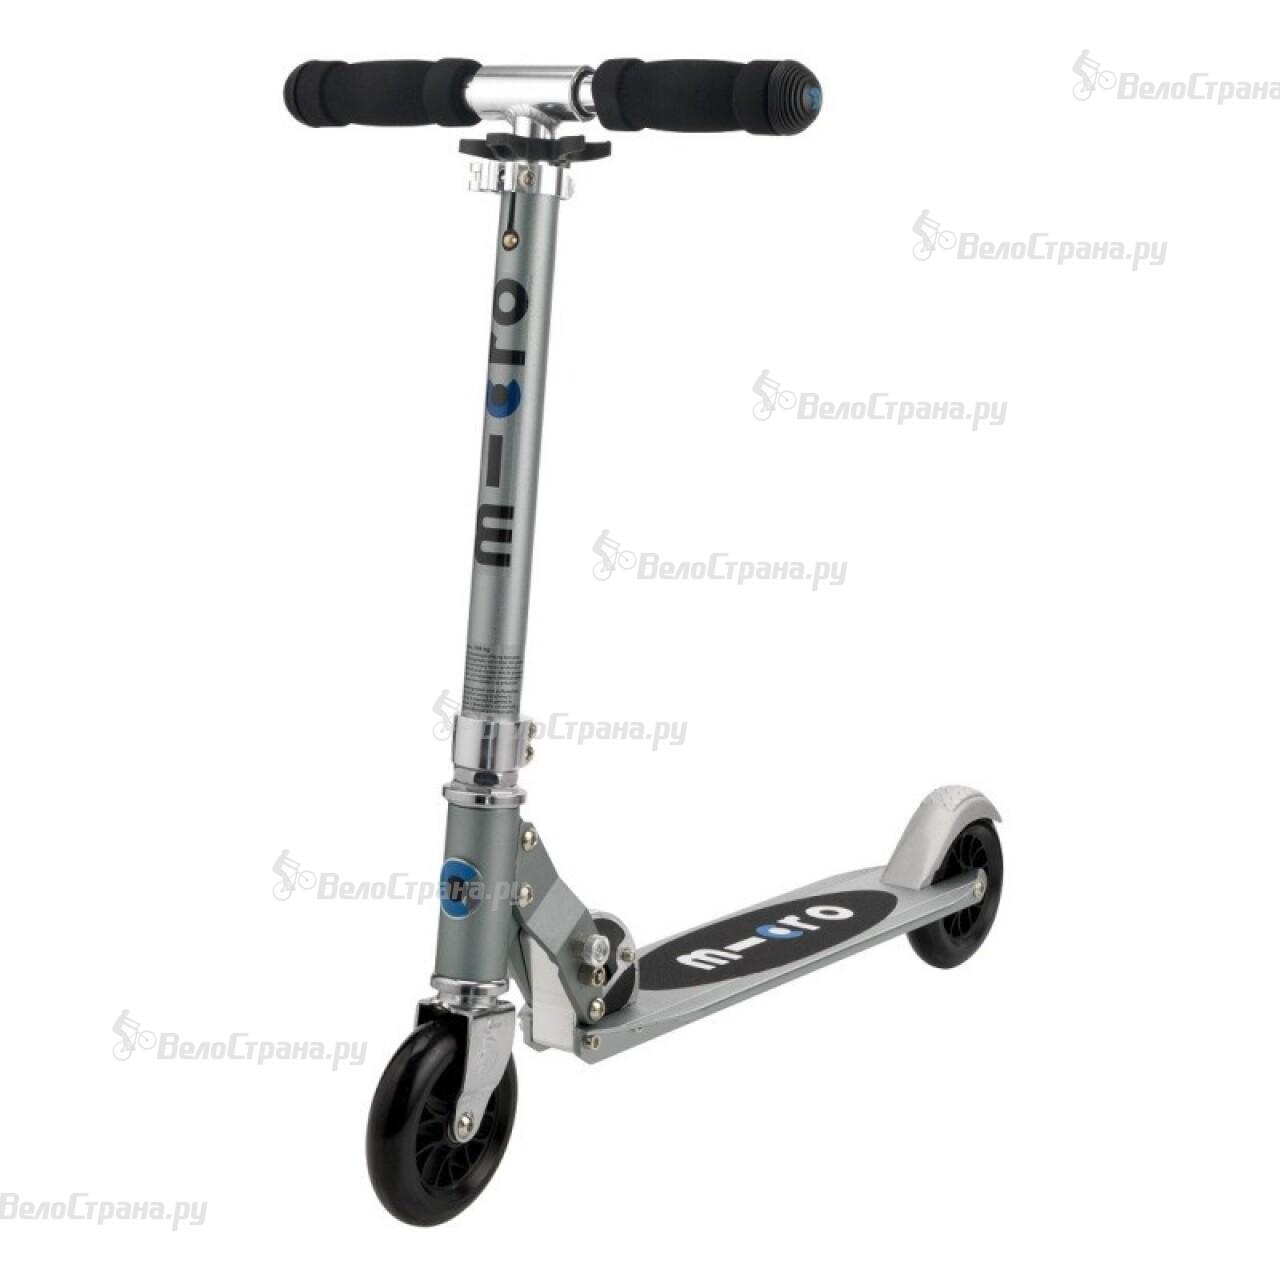 Самокат Micro SCOOTER BULLET самокат scooter